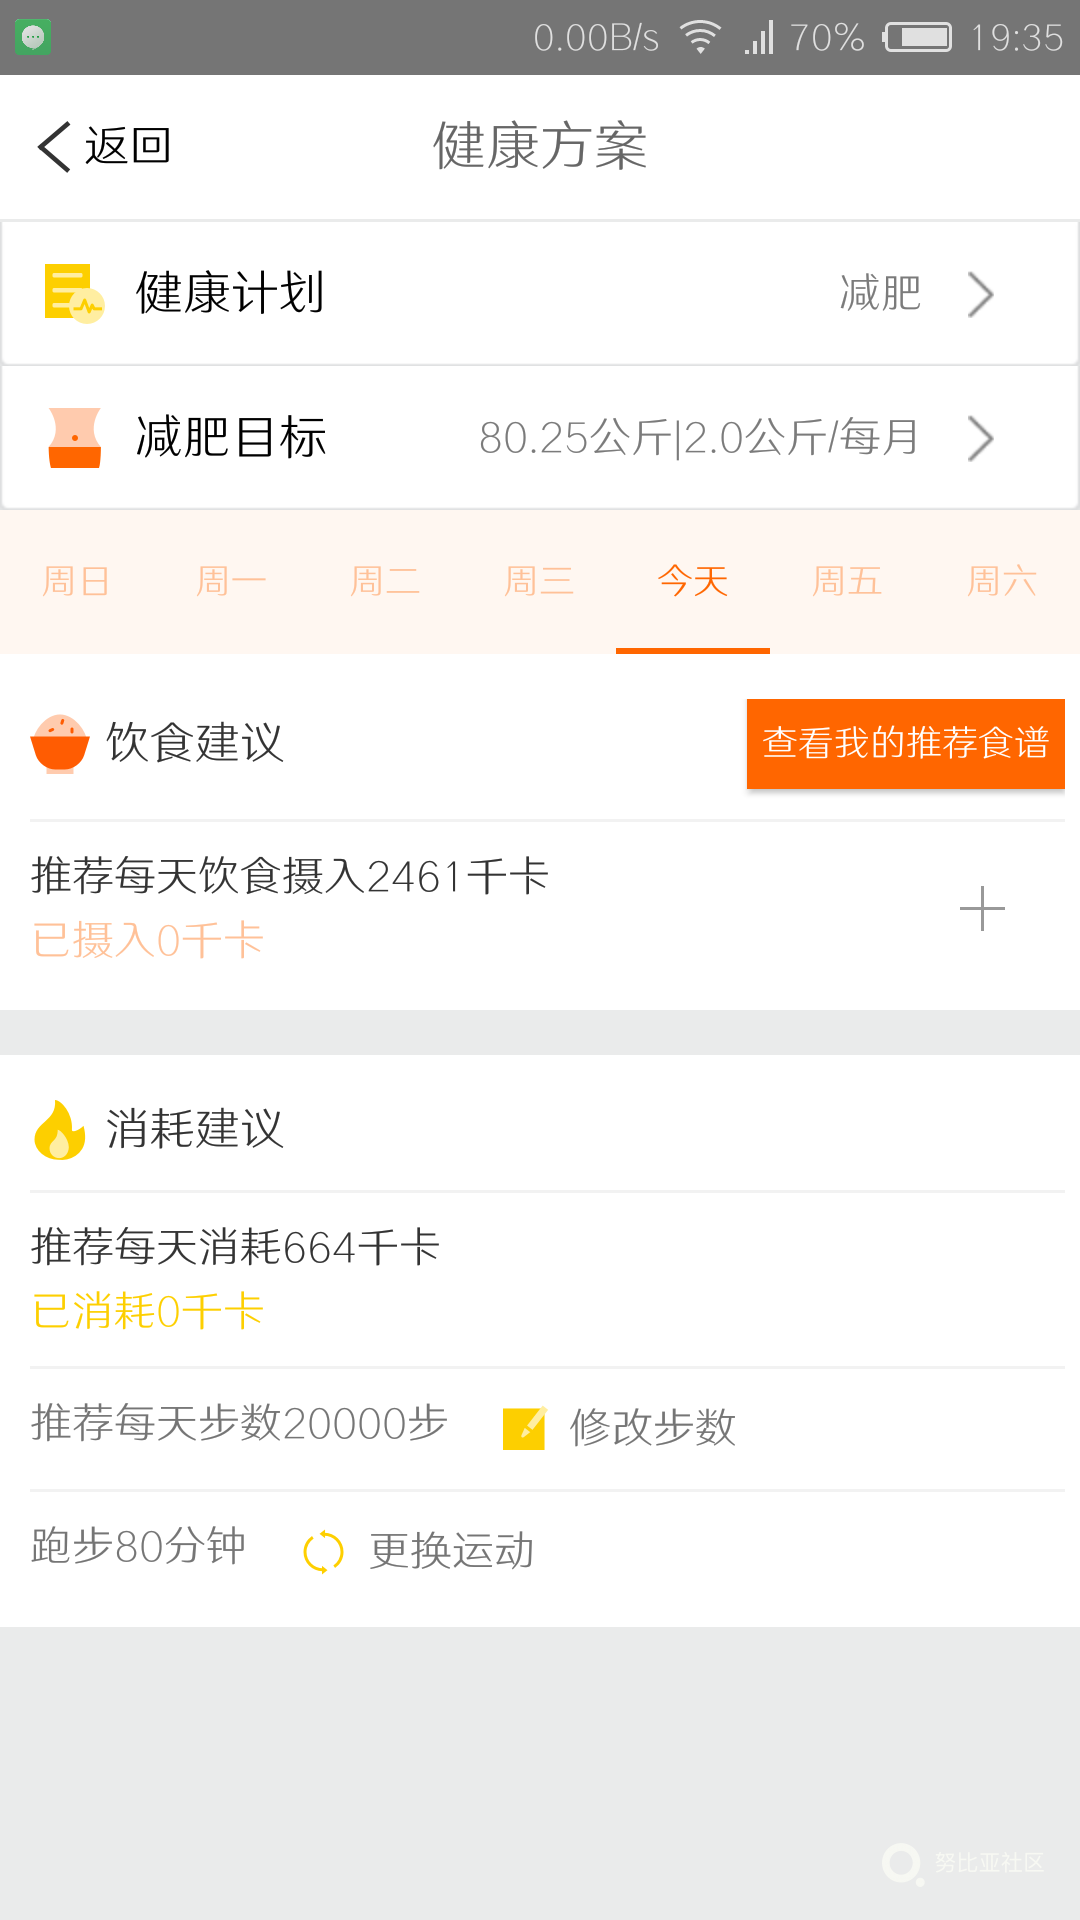 Screenshot_2018-01-25-19-35-09.png